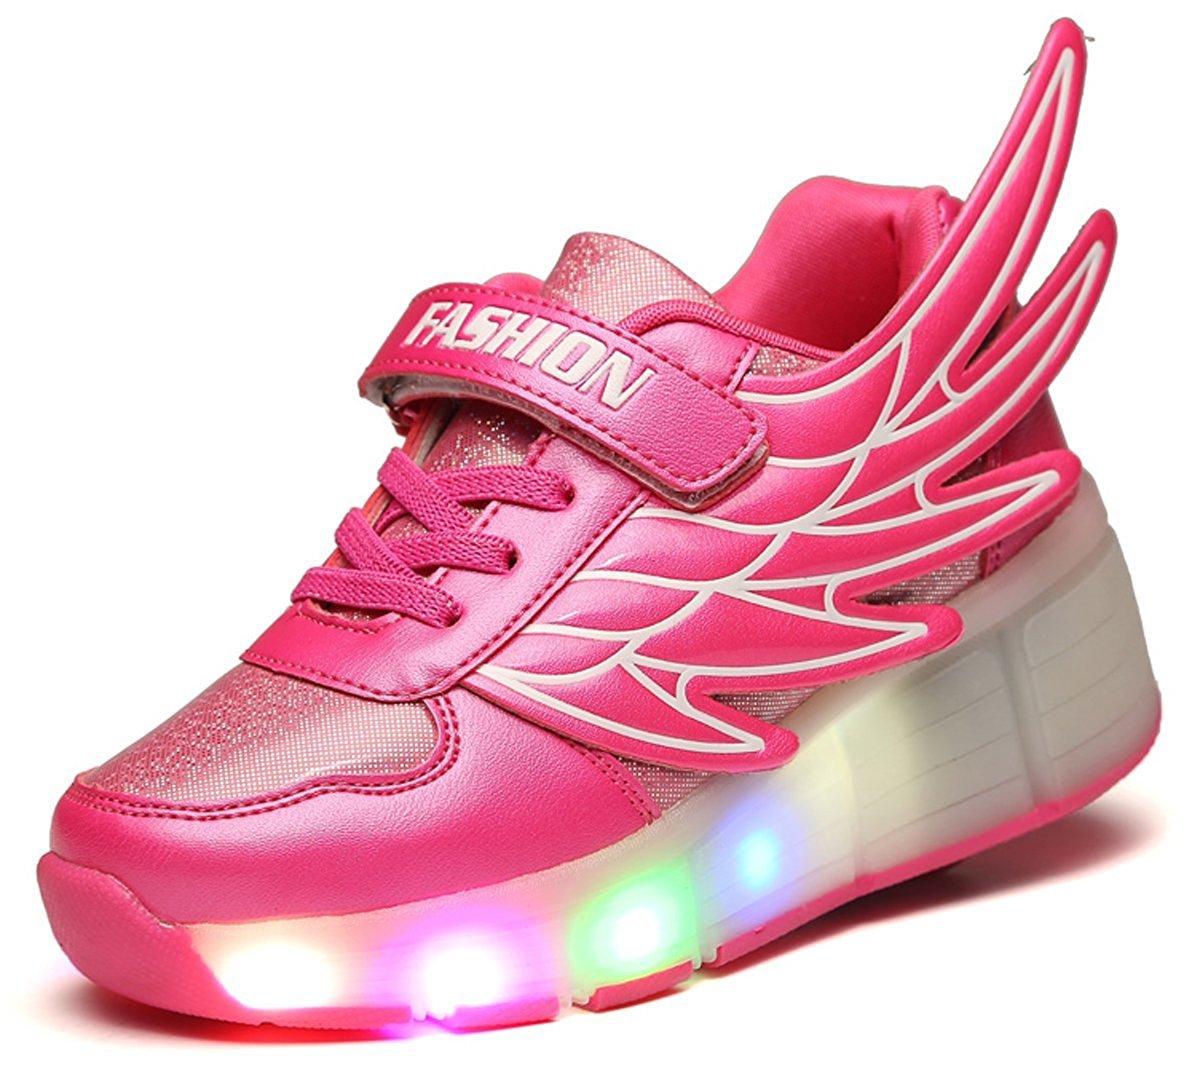 pit4tk LED Light Up Roller Wheel Shoes Athletic Sneaker Sport Shoe Dance Boot Kid Wing Christmas Pink